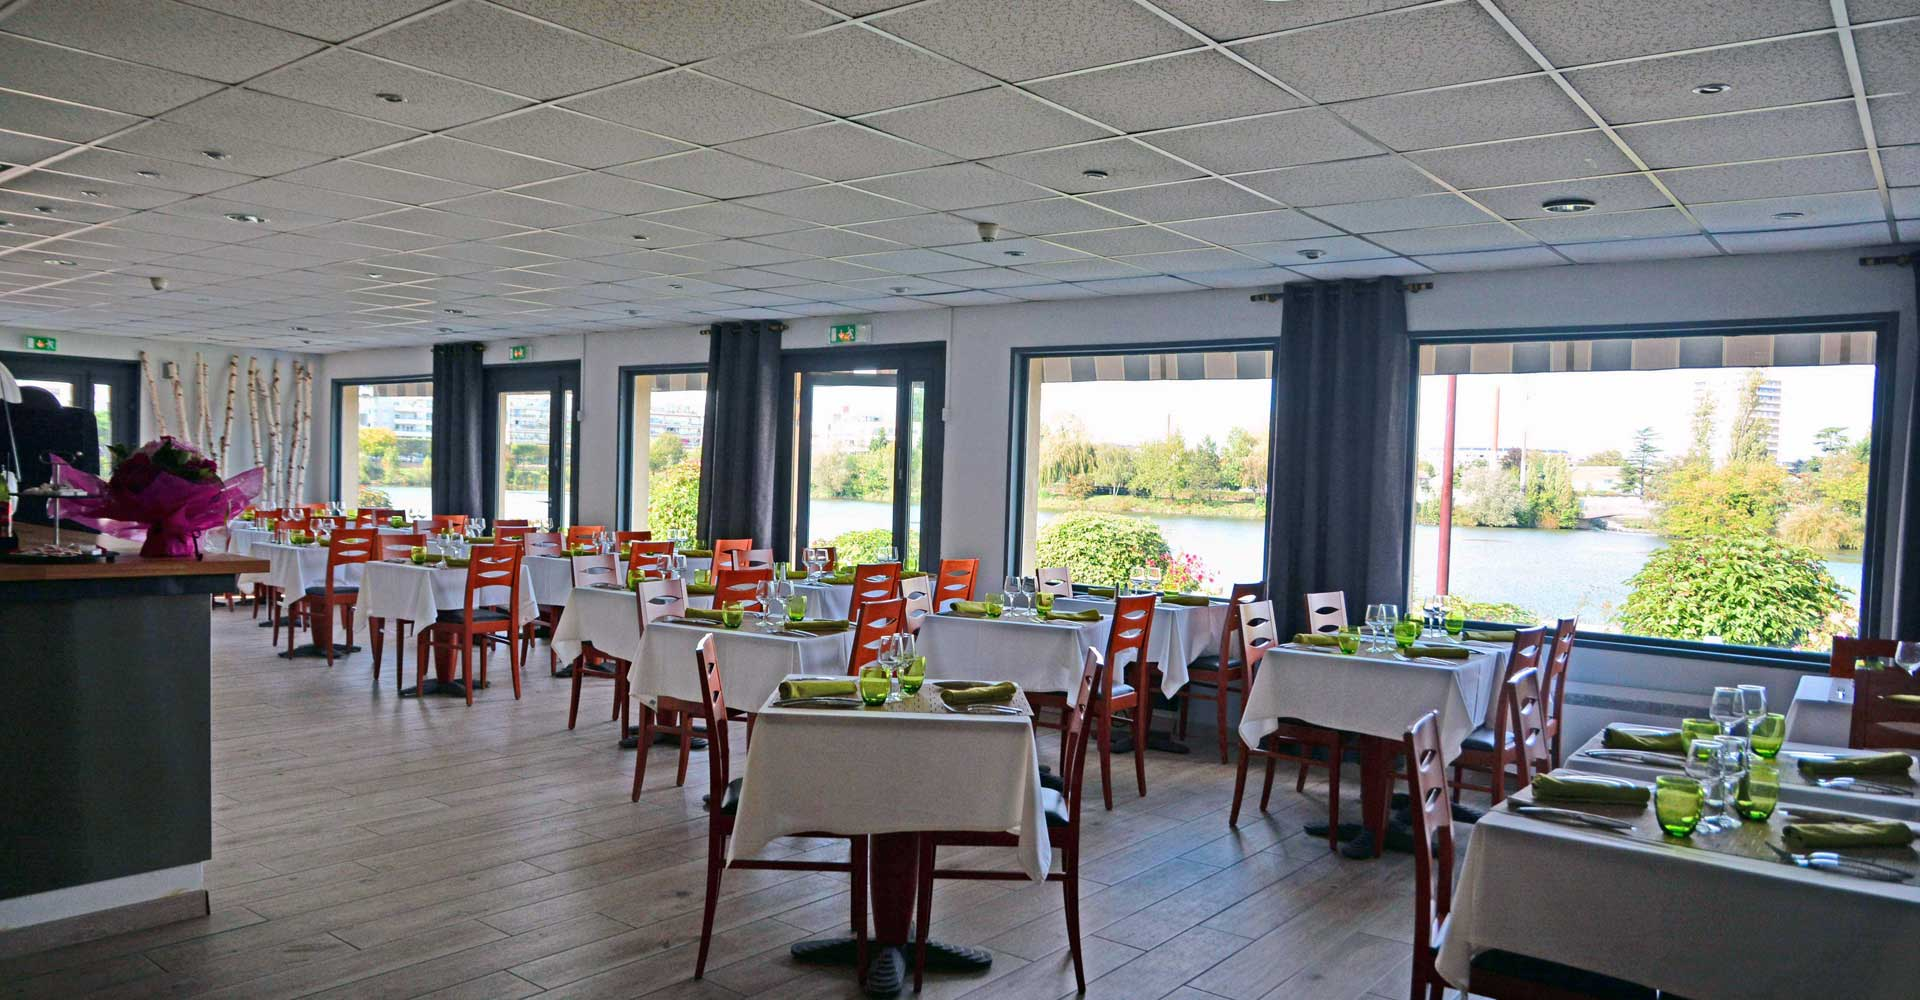 restaurant de charme l 39 envol e au bord de lac viry chatillon proche d 39 evry. Black Bedroom Furniture Sets. Home Design Ideas